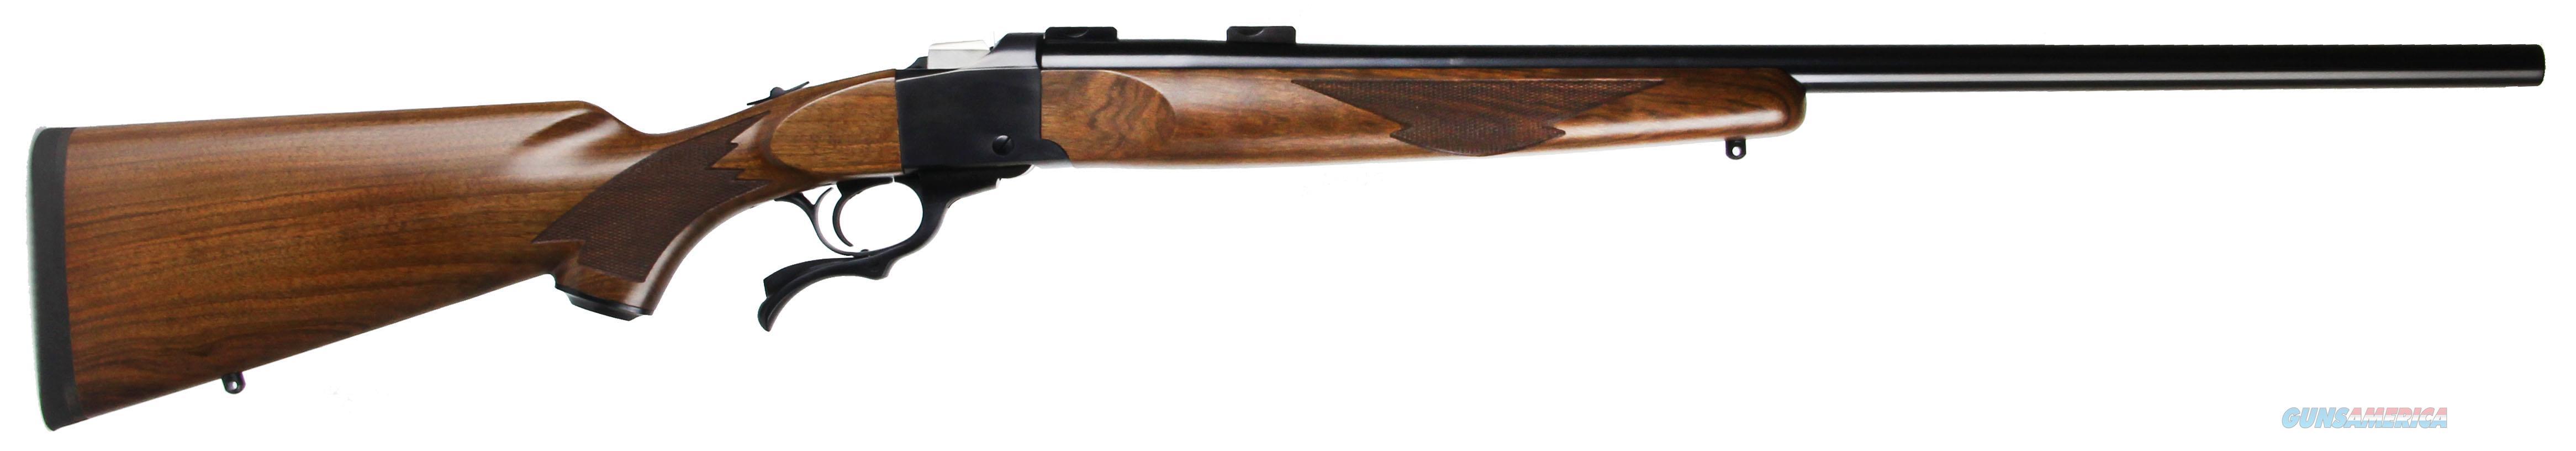 Ruger No 1V 243Win Varminter Blued Walnut 21300  Guns > Rifles > R Misc Rifles